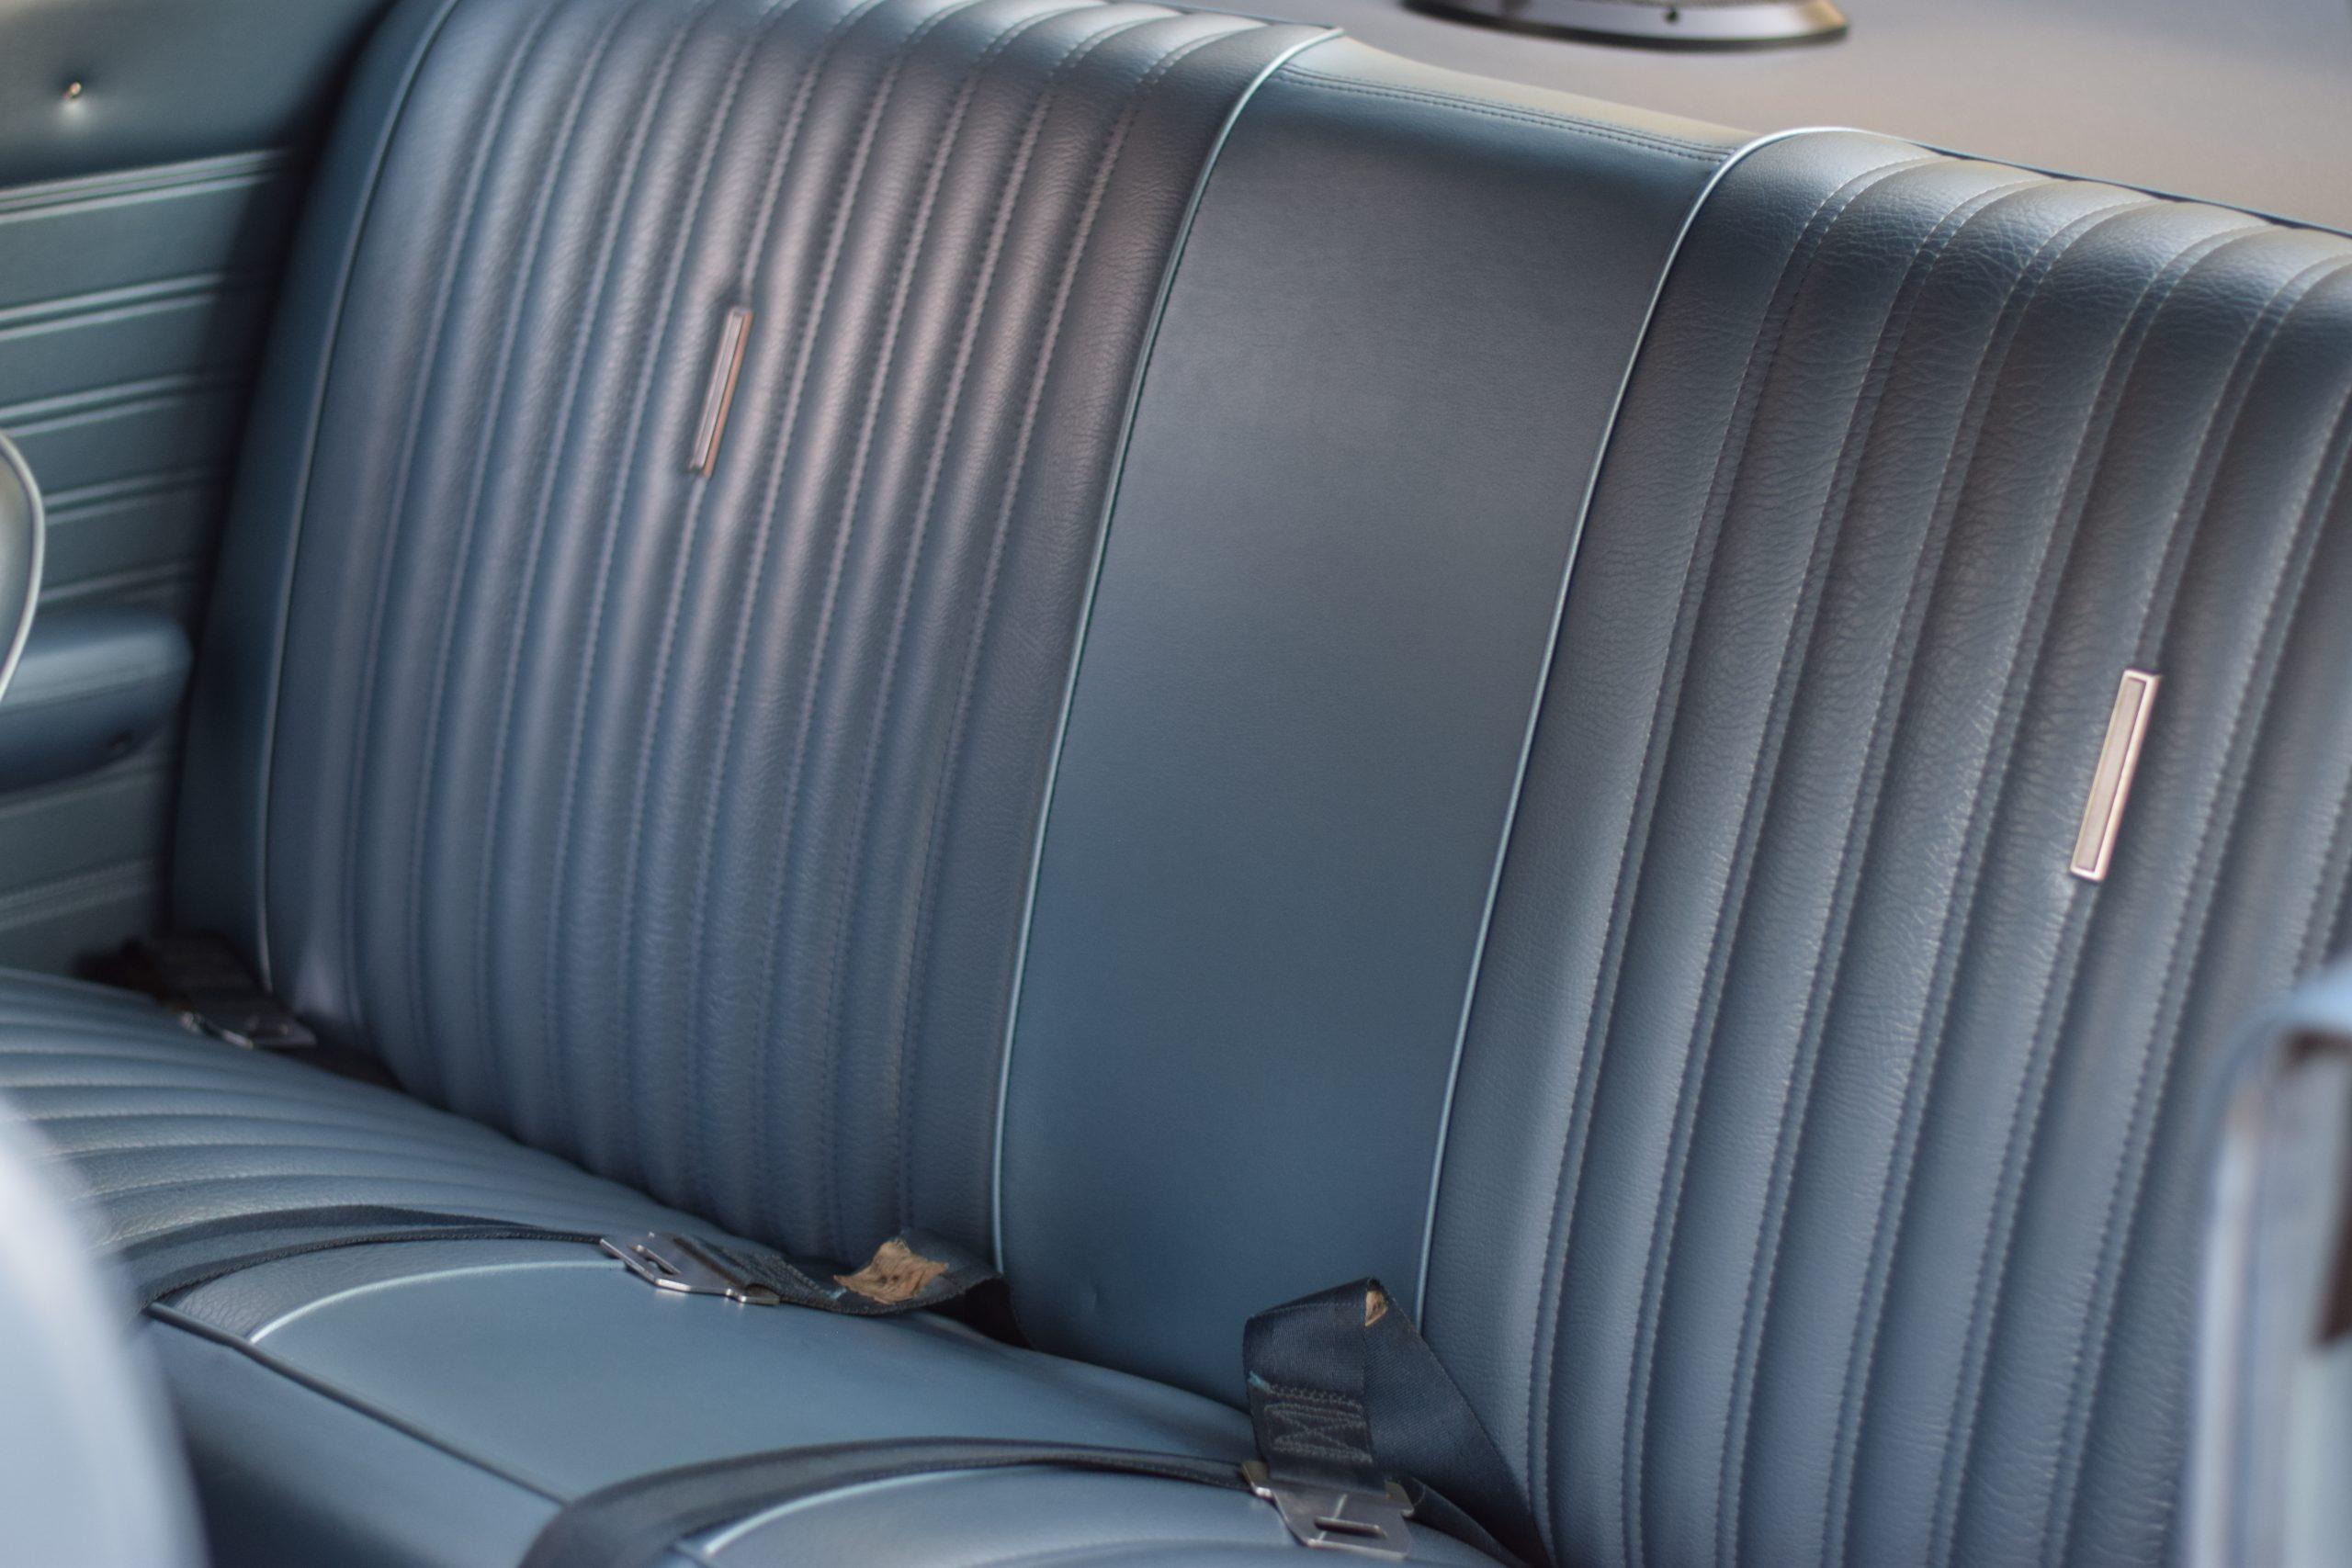 1969 Ford Torino interior rear seat